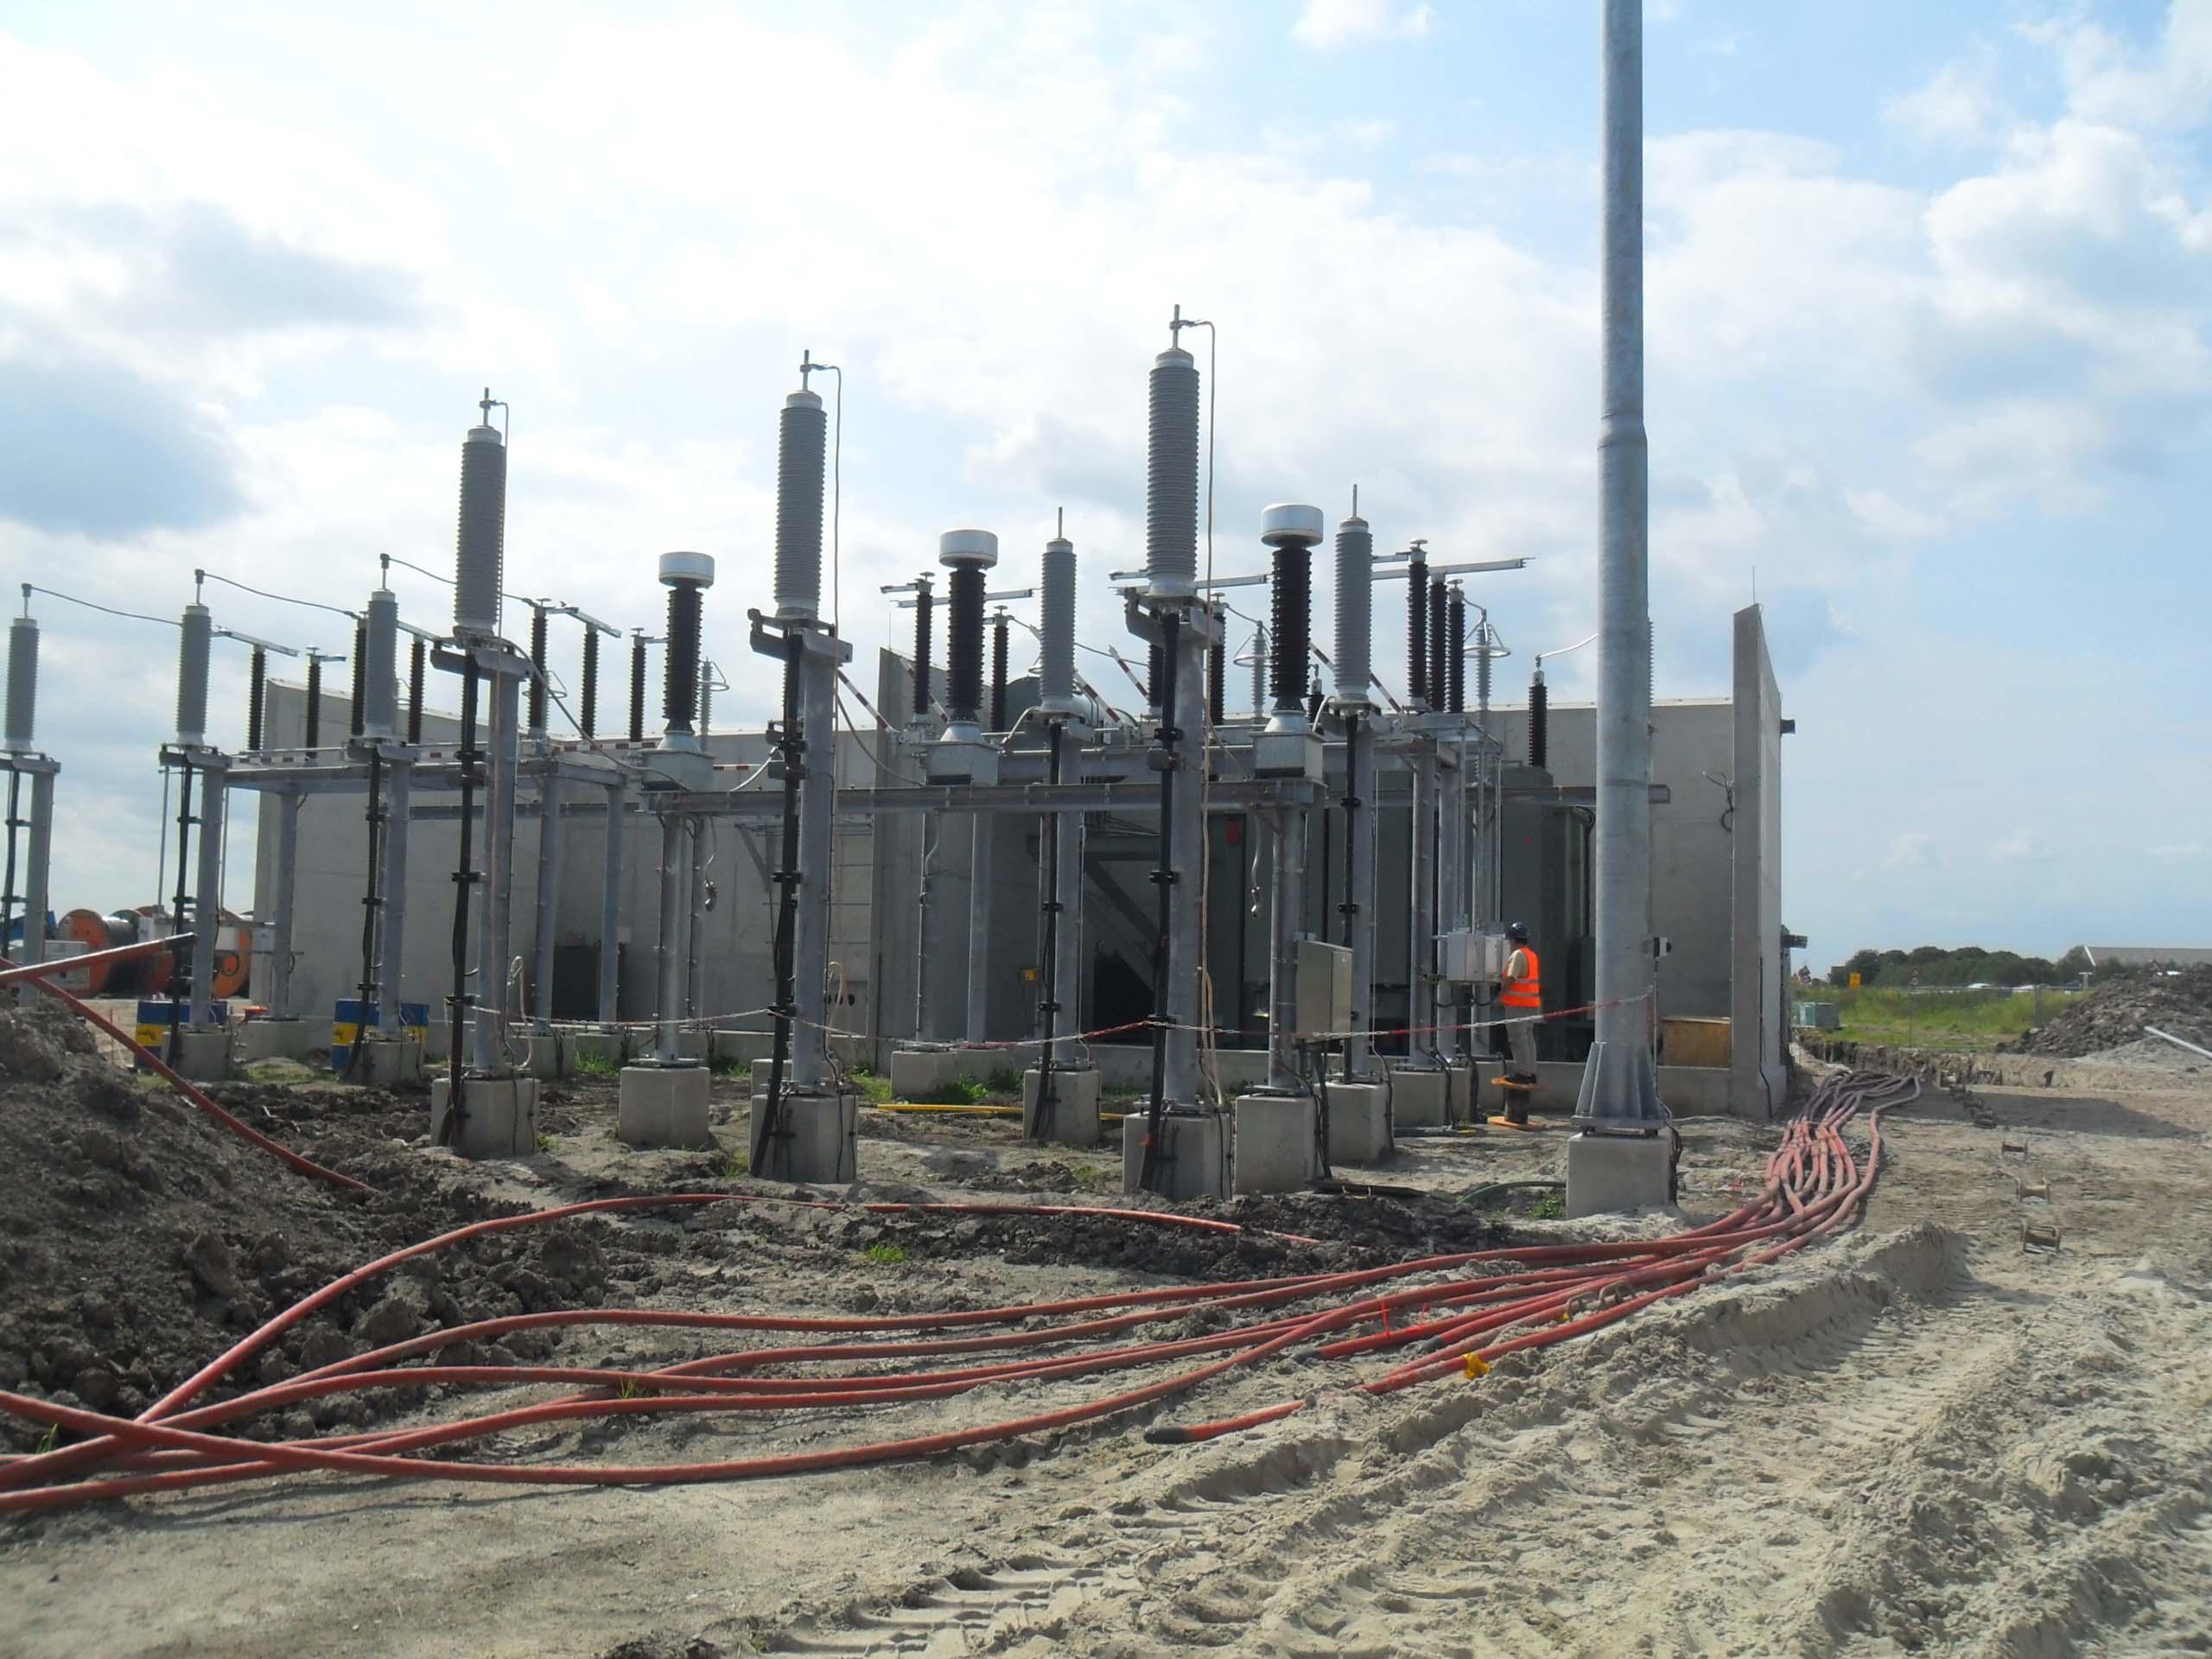 Windpark Zuidlob